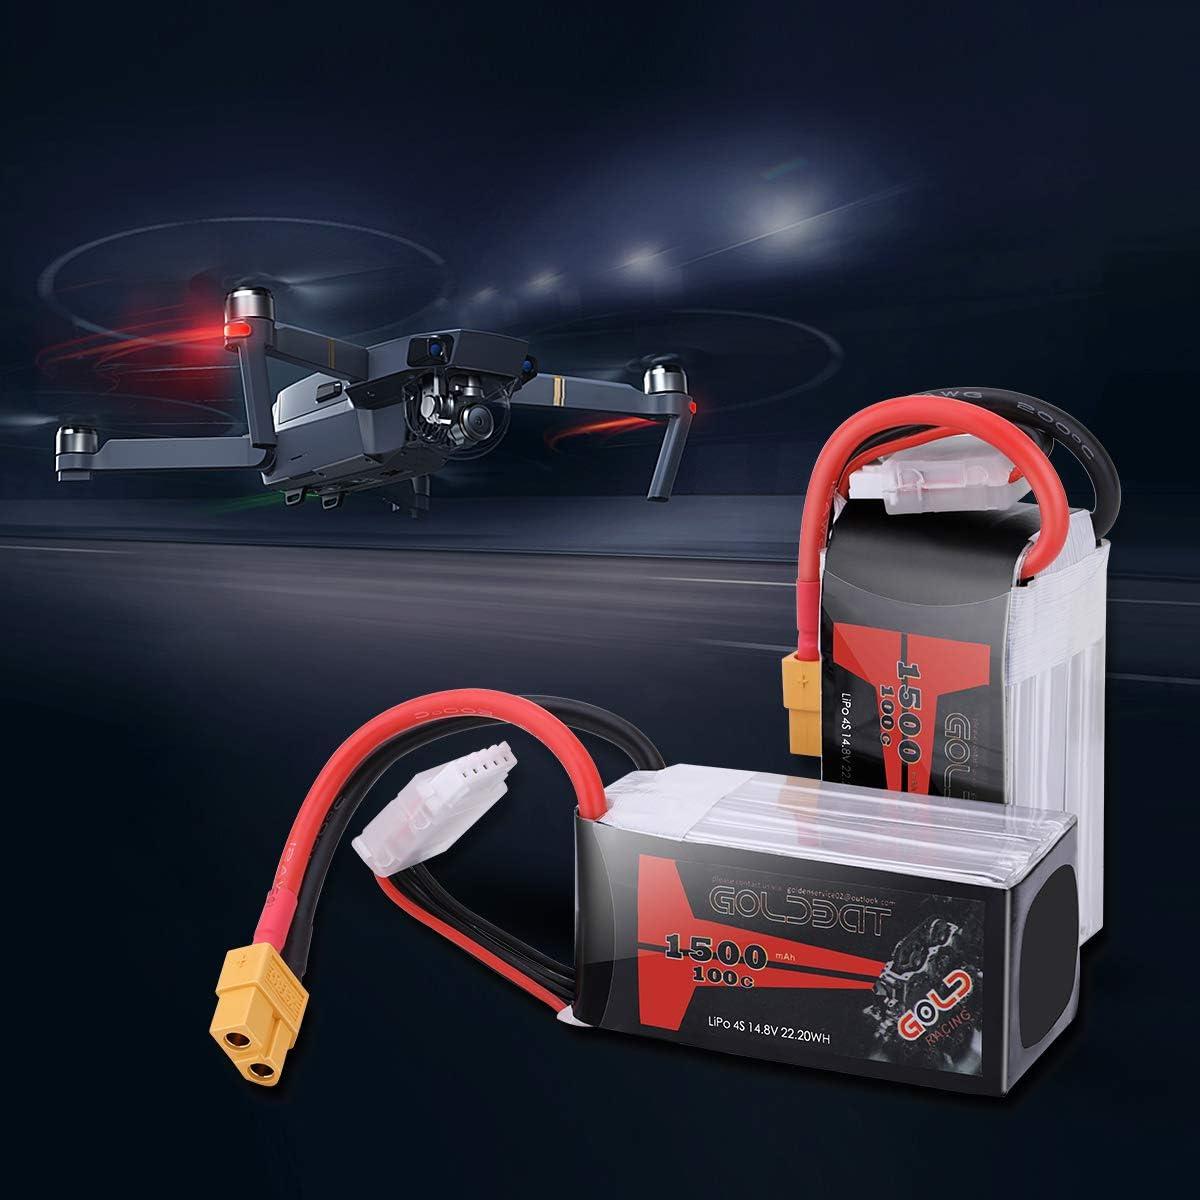 2 Pack GOLDBAT 1500mAh 4S 100C 14.8V Lipo Battery Softcase Pack with XT60 Plug for RC Boat Heli Airplane UAV Drone FPV